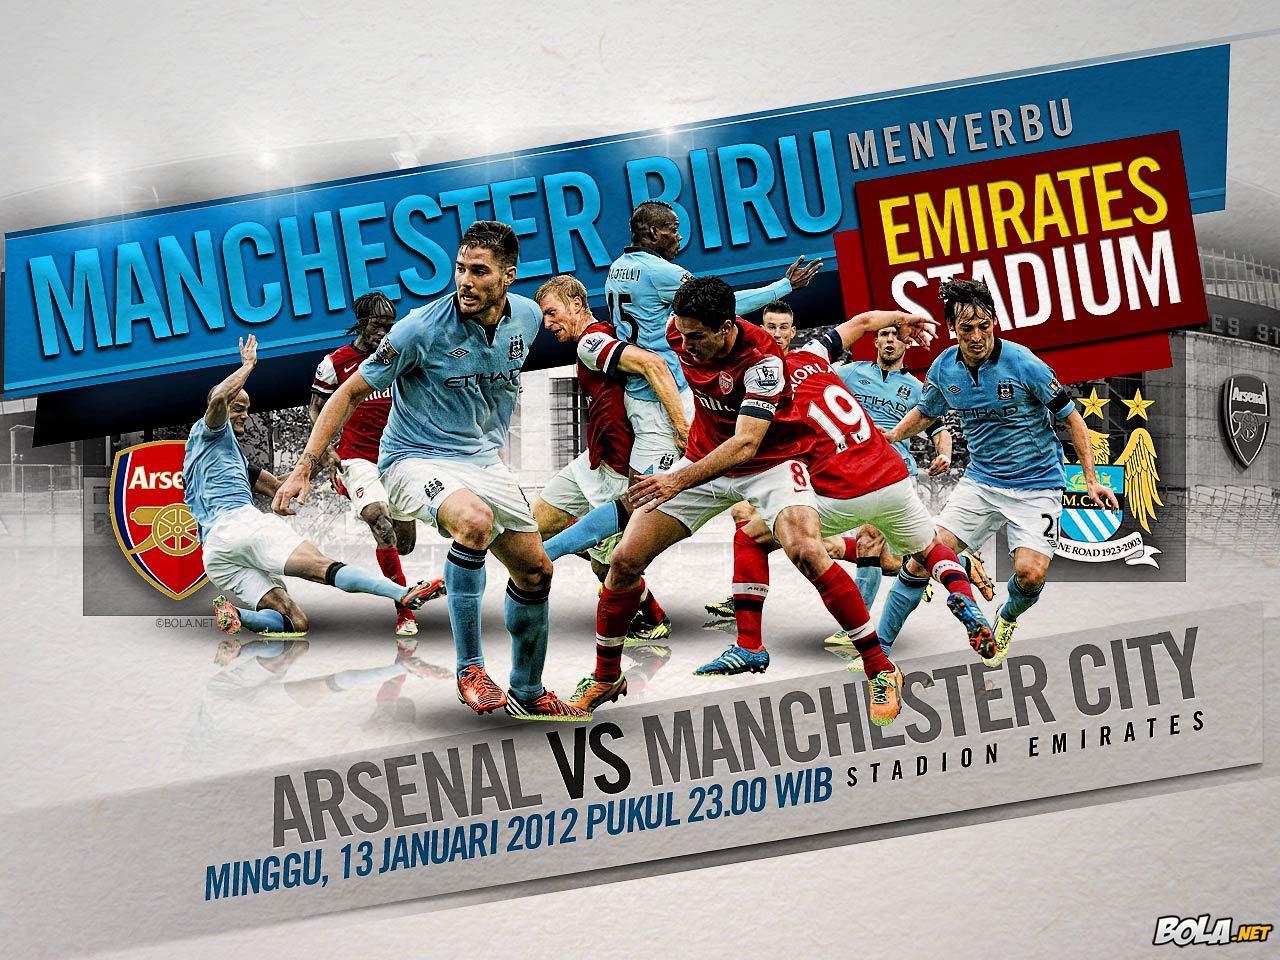 Arsenal vs Manchester City - 13 Januari 2013